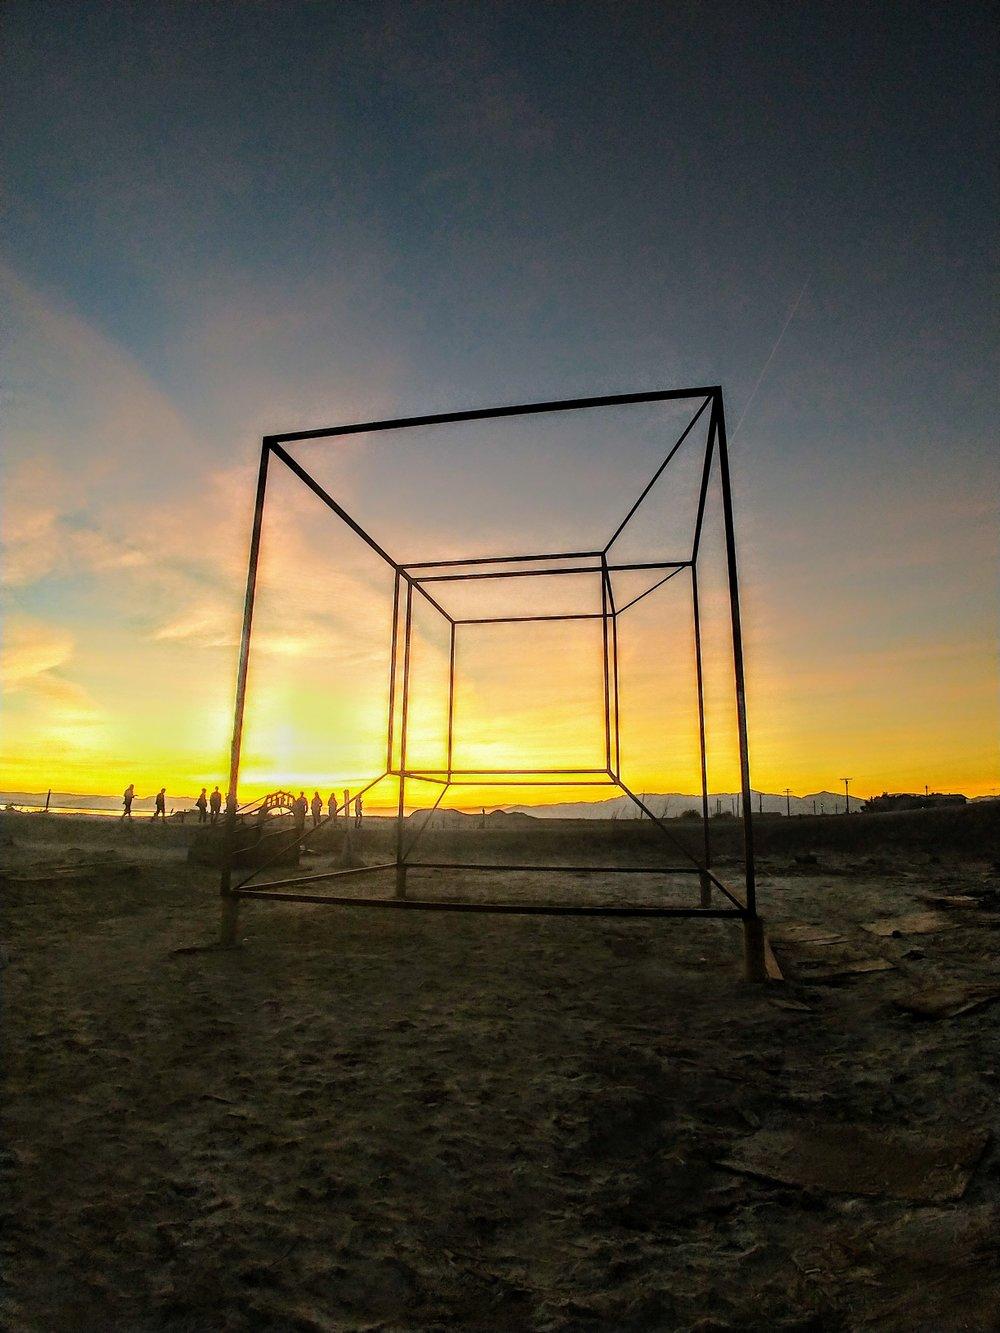 Behold the Tesseract, Bombay Beach, CA!